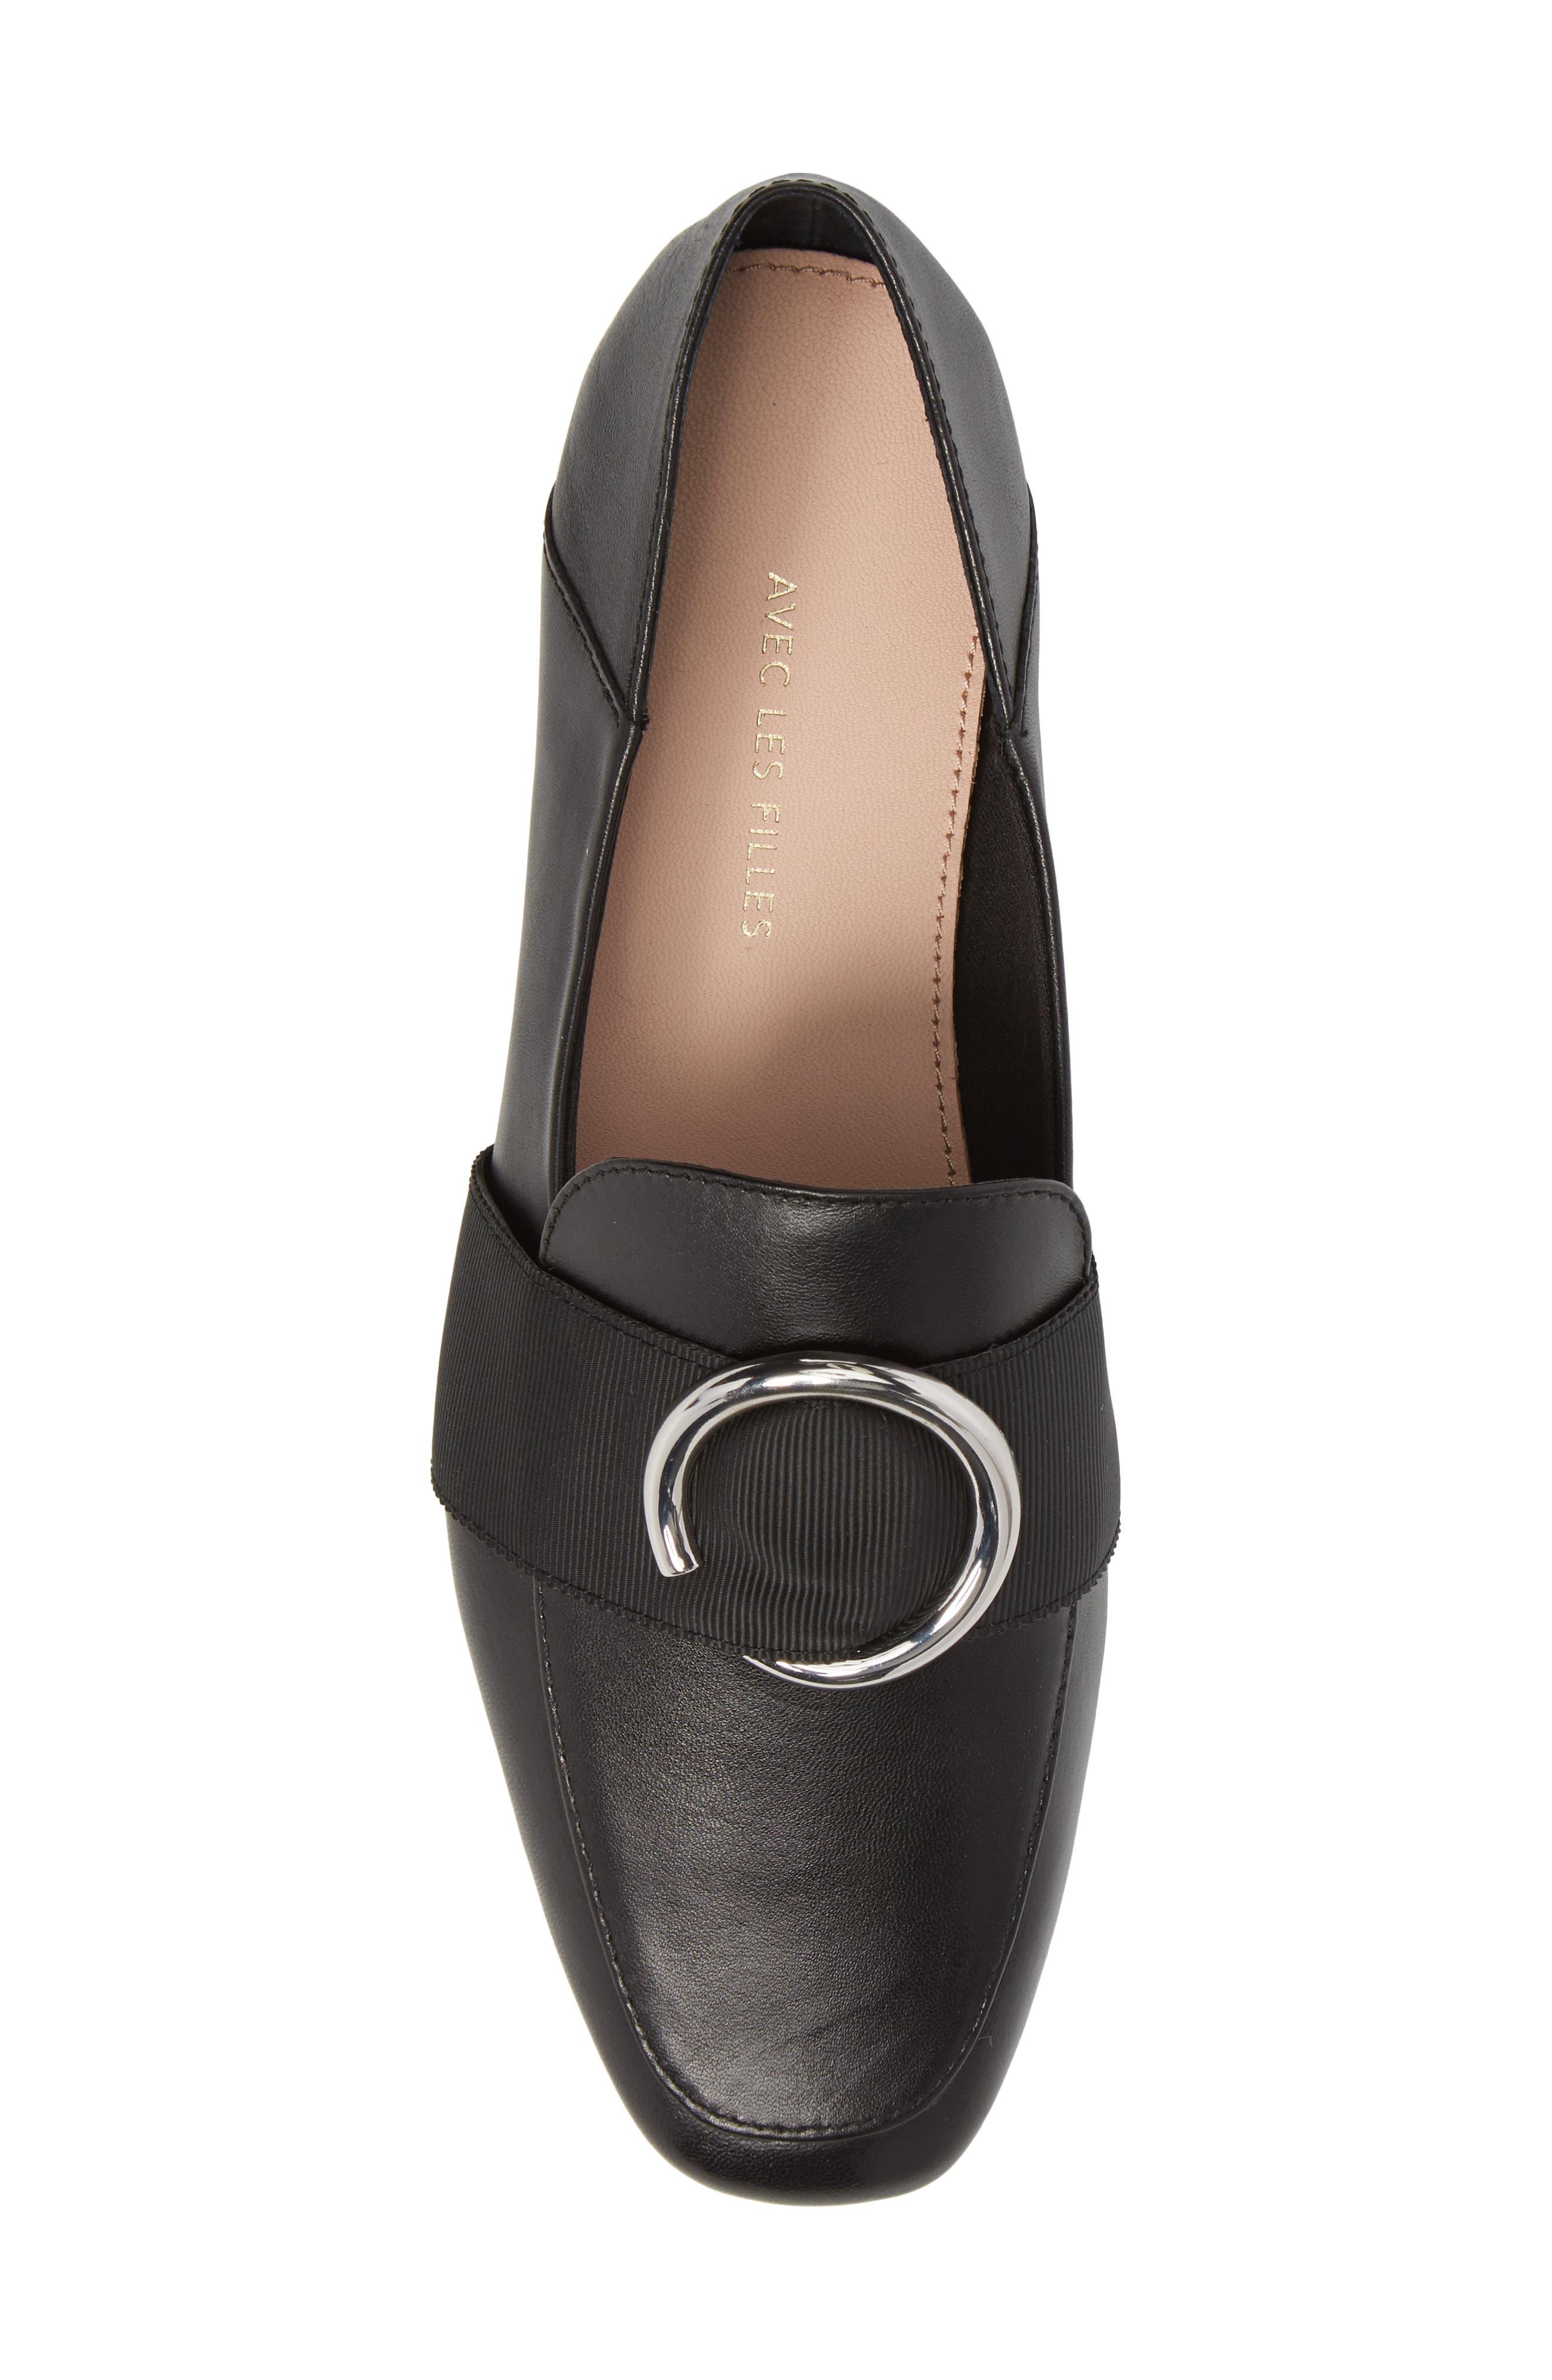 Ilani Convertible Slip Ring Loafer,                             Alternate thumbnail 5, color,                             001